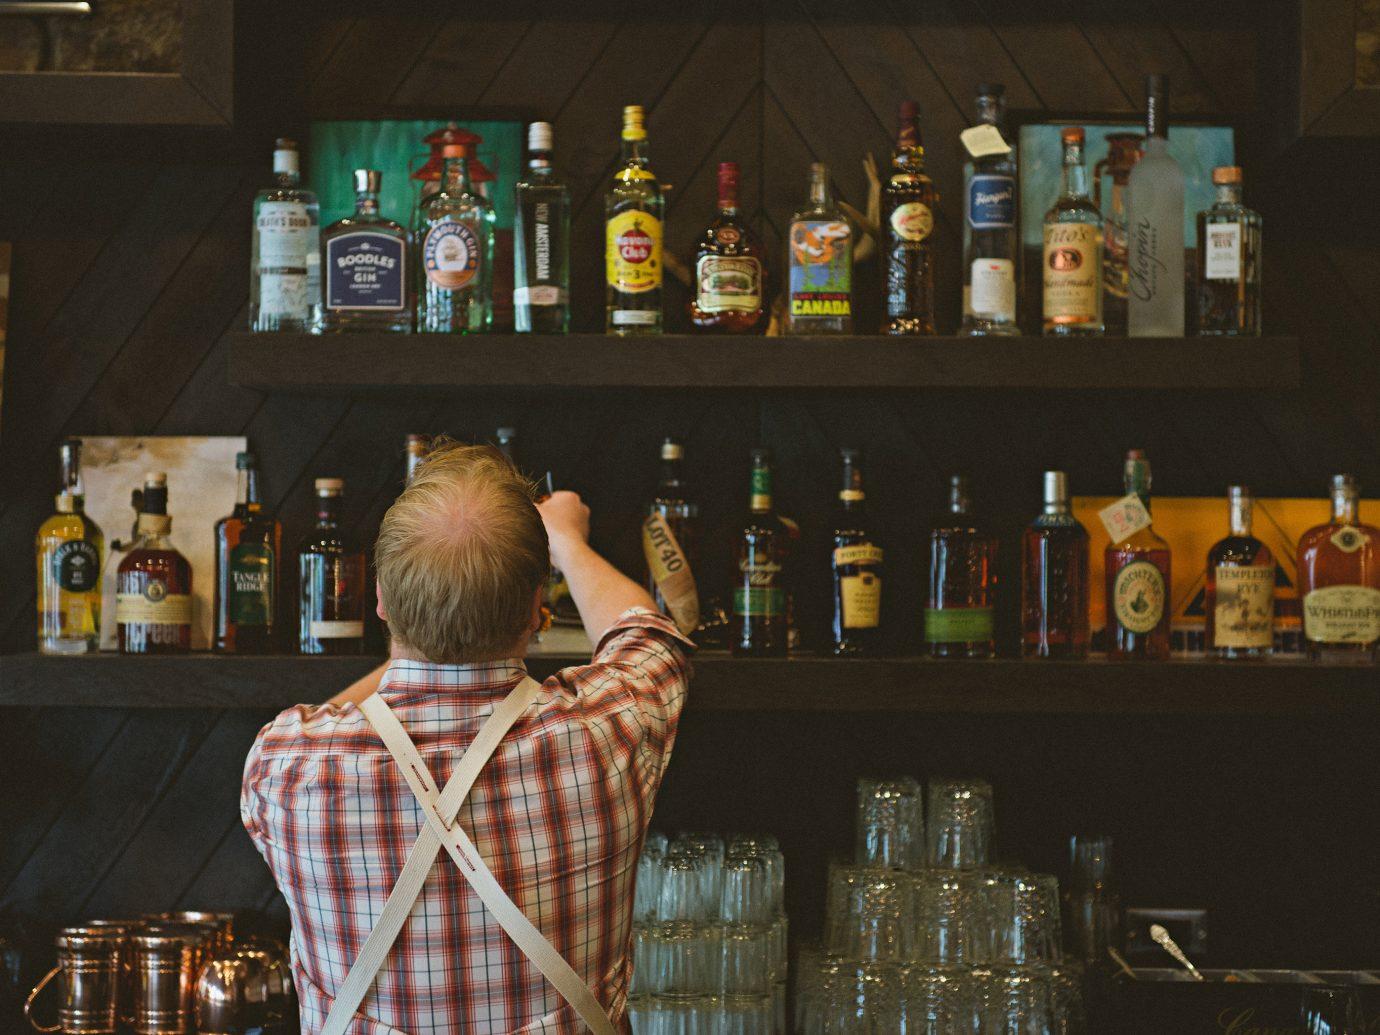 Alberta Canada Road Trips bottle person indoor Bar Drink alcohol sense distilled beverage drinking